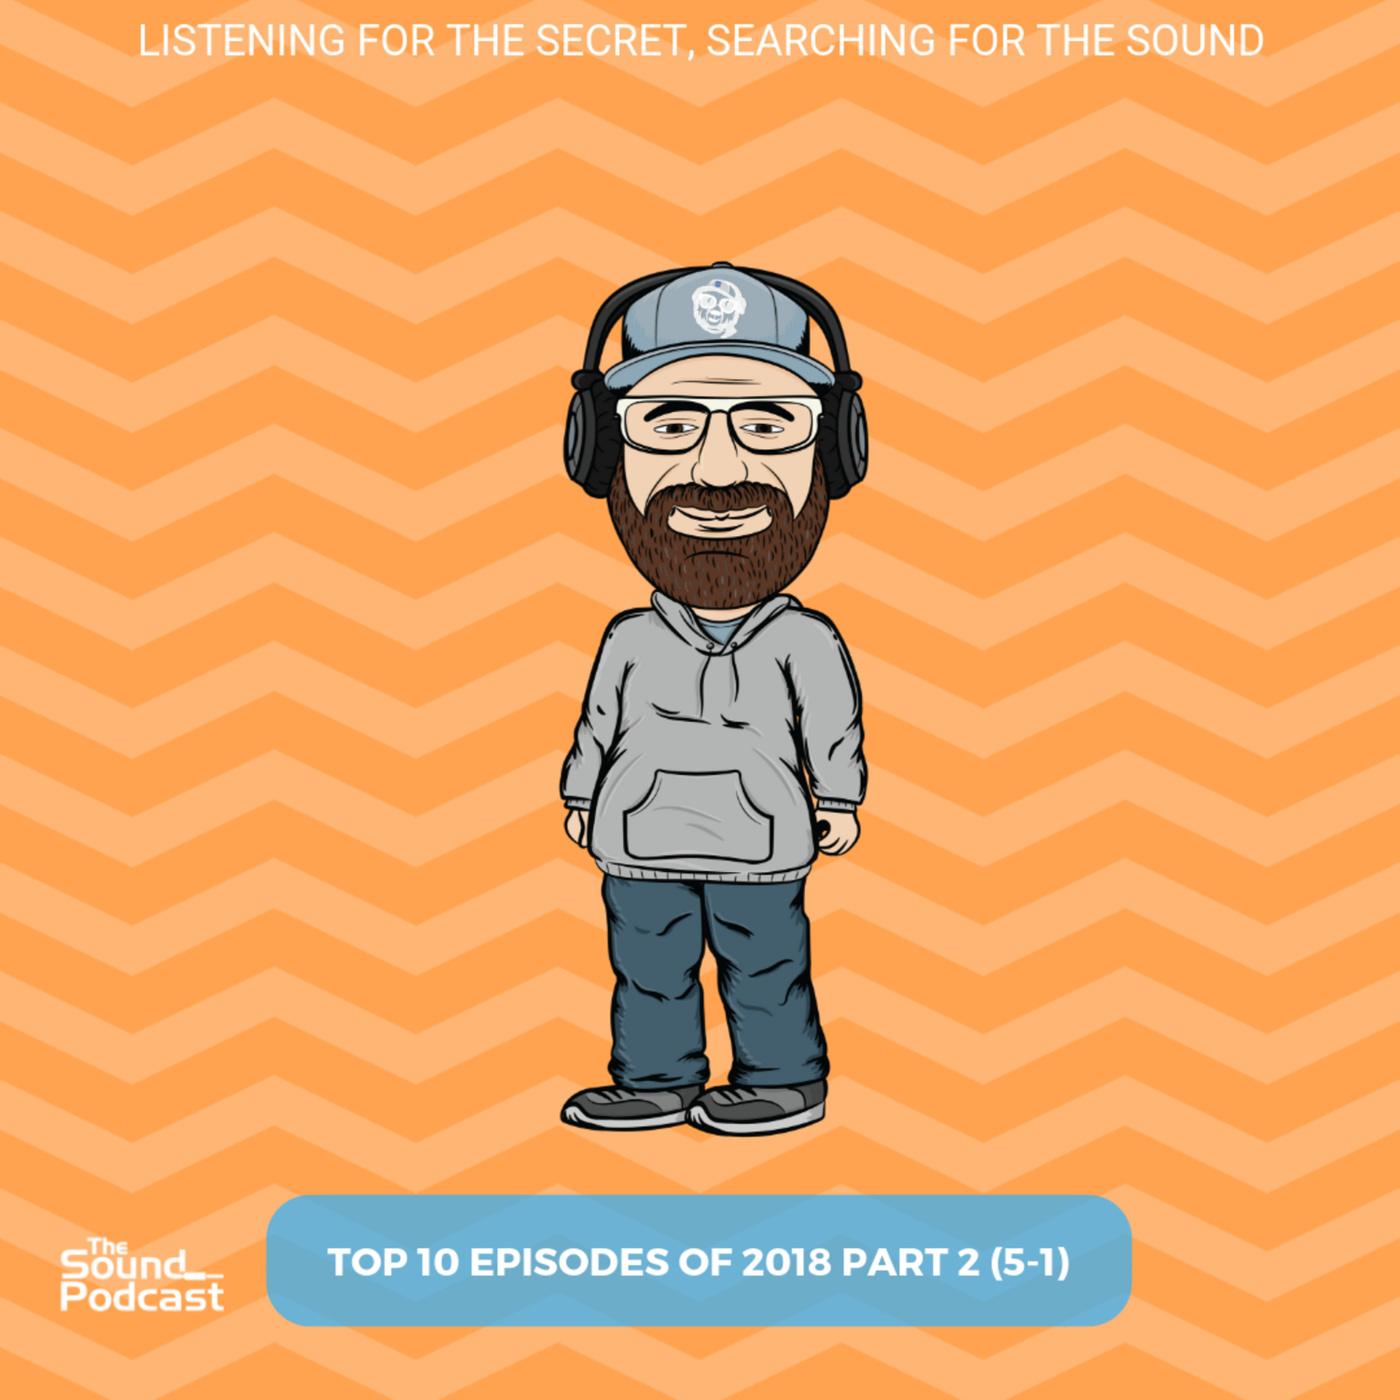 Episode 164: Top 10 Episodes of 2018 - Part 2 (5-1)